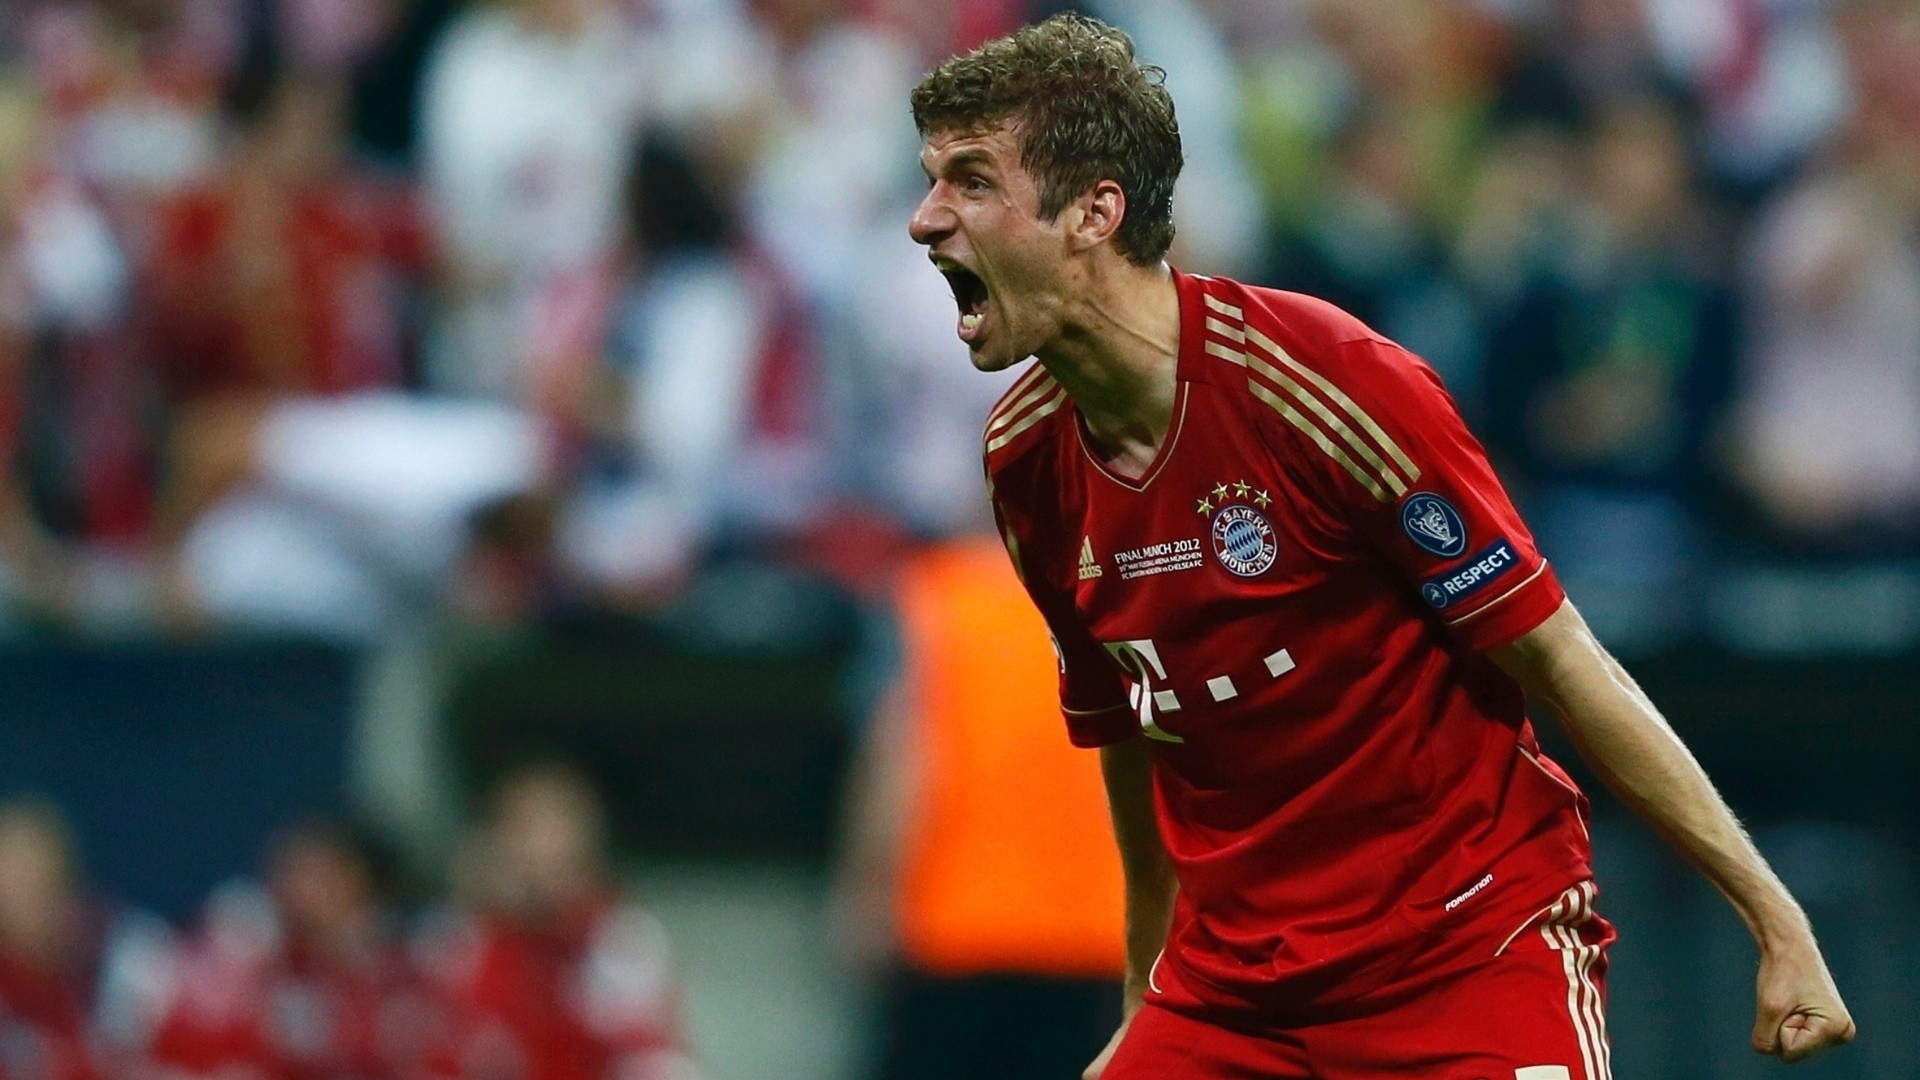 Thomas-Muller-celebrating